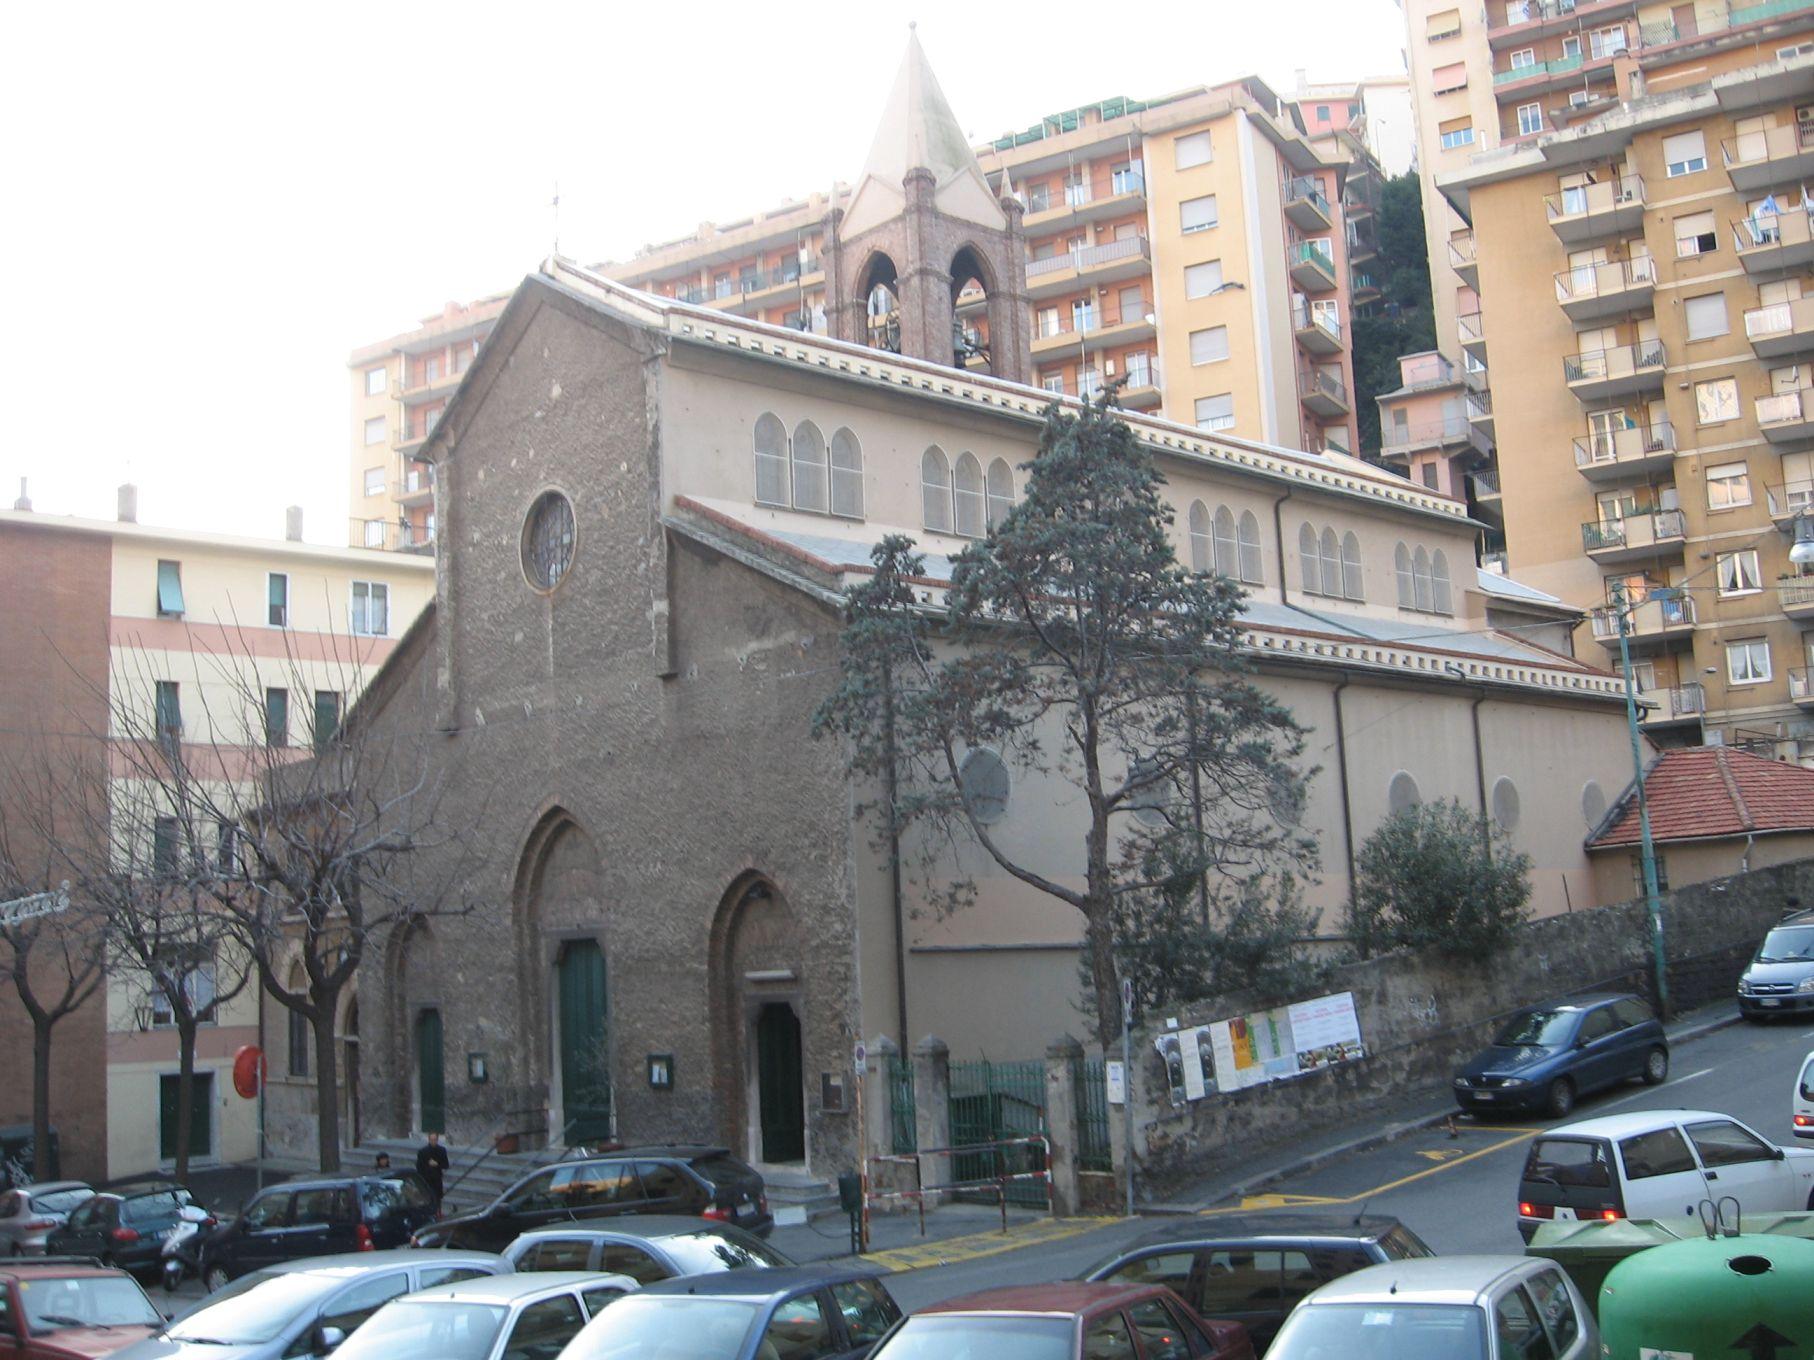 chiesa_lagaccio_ridotta-2008-11-27-164430.jpg